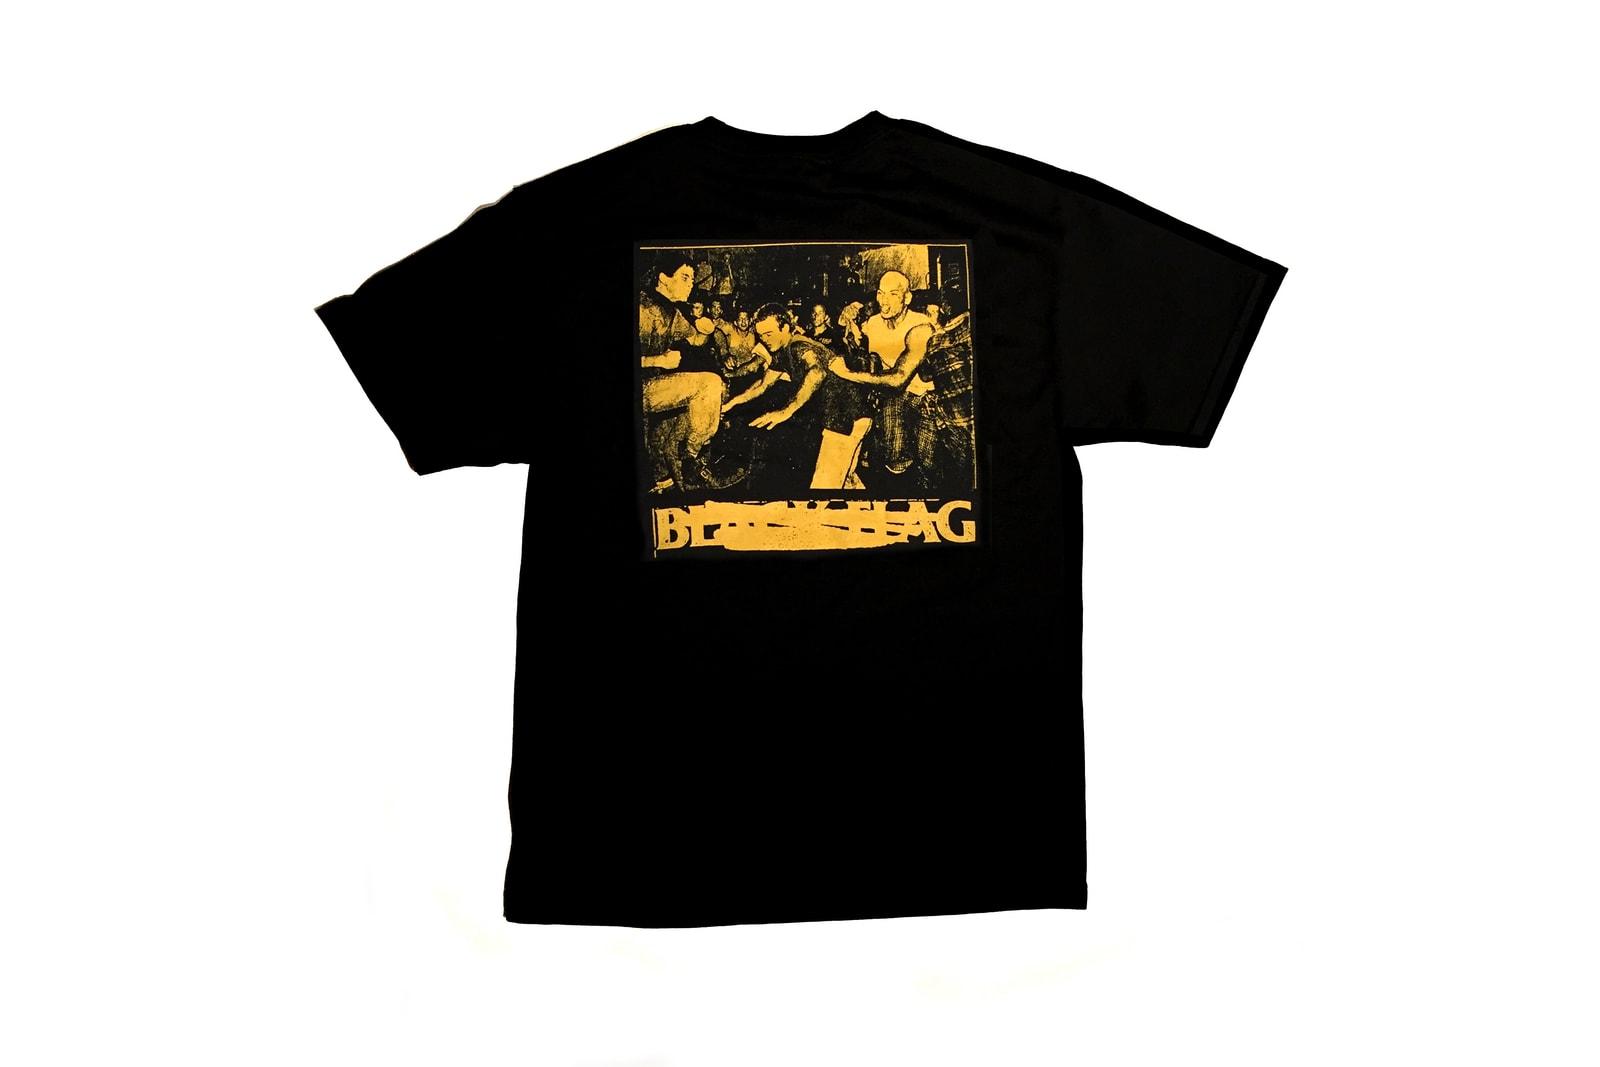 Bootleg Merchandise The Grateful Dead Life of Pablo Merch